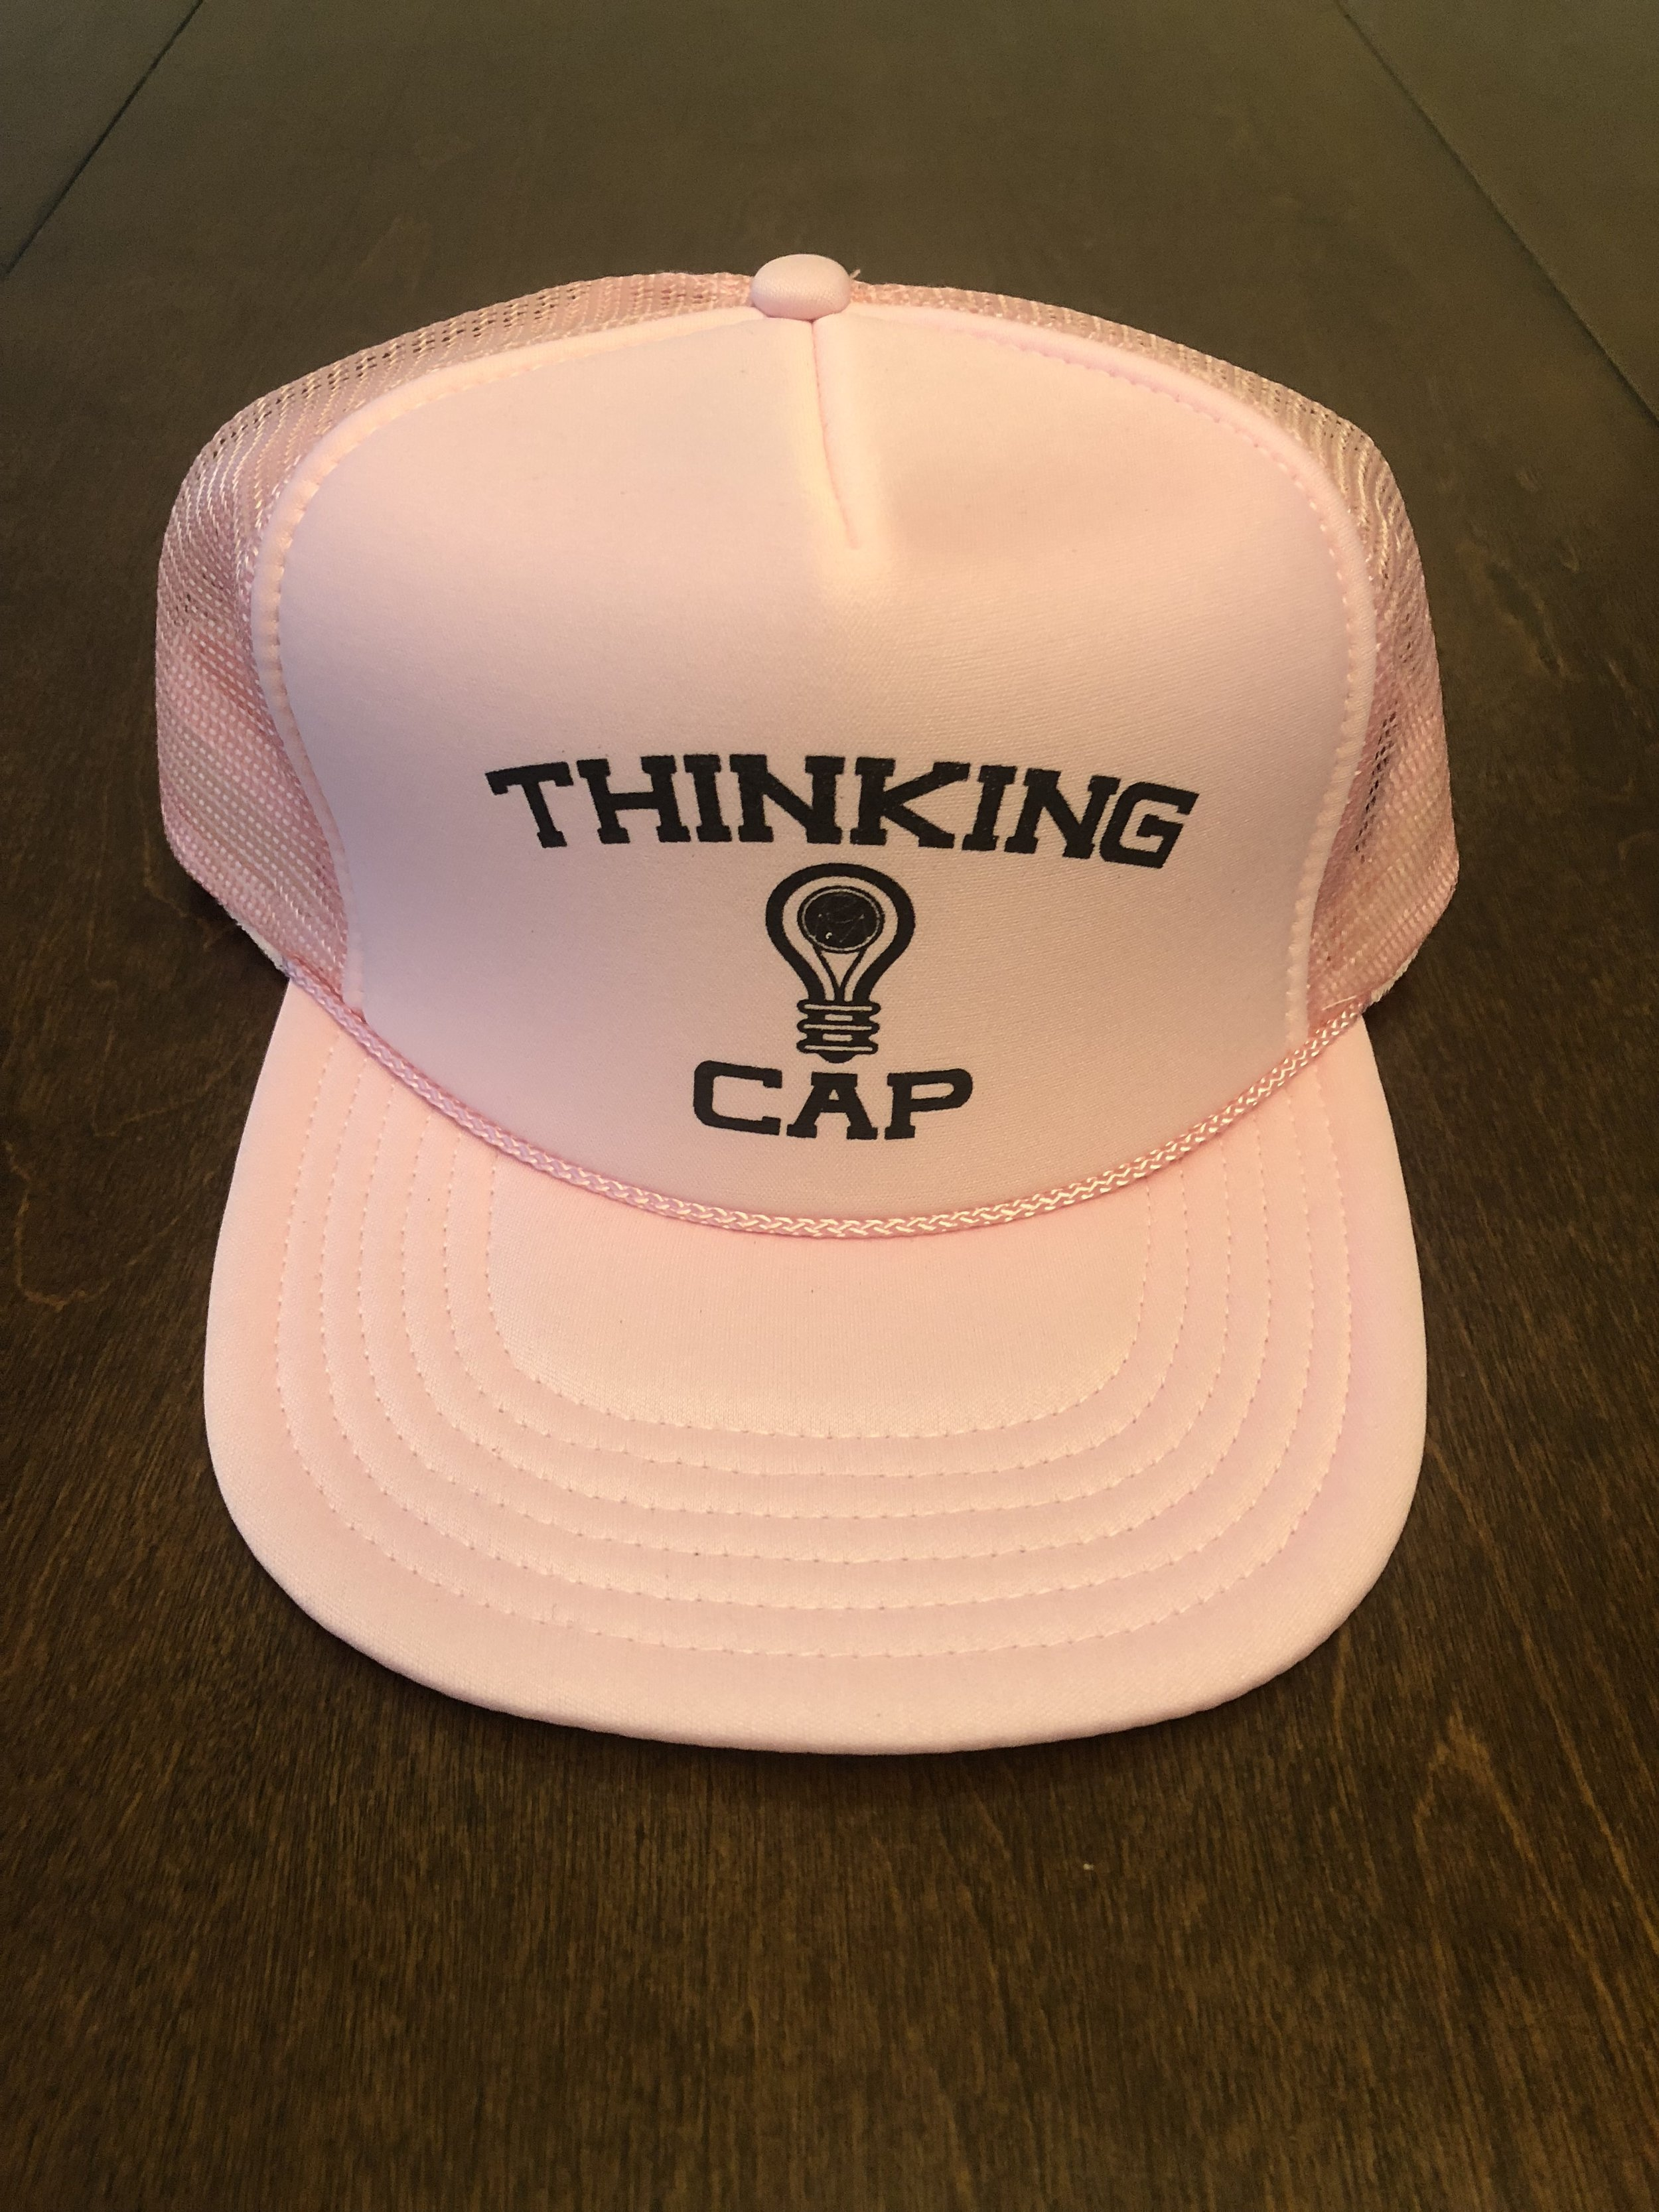 9cc20549ad029 Thinking Cap